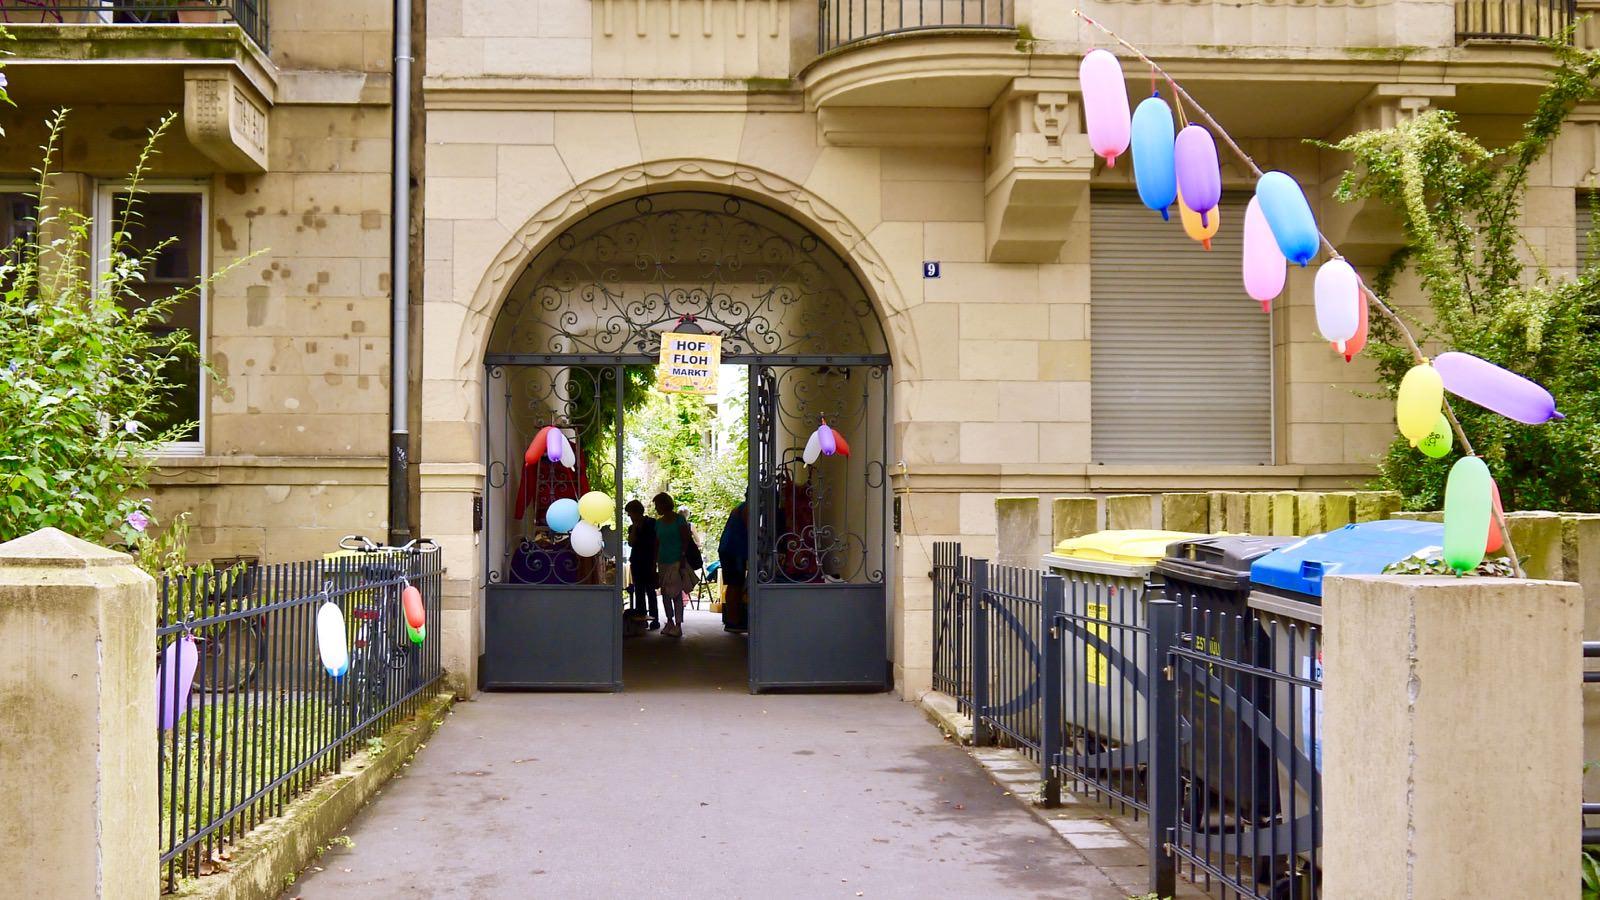 Bunte Ballons zeigen den Weg zum Flohmarkt im Hof (Archivbild 2018) | Foto: M. Schülke